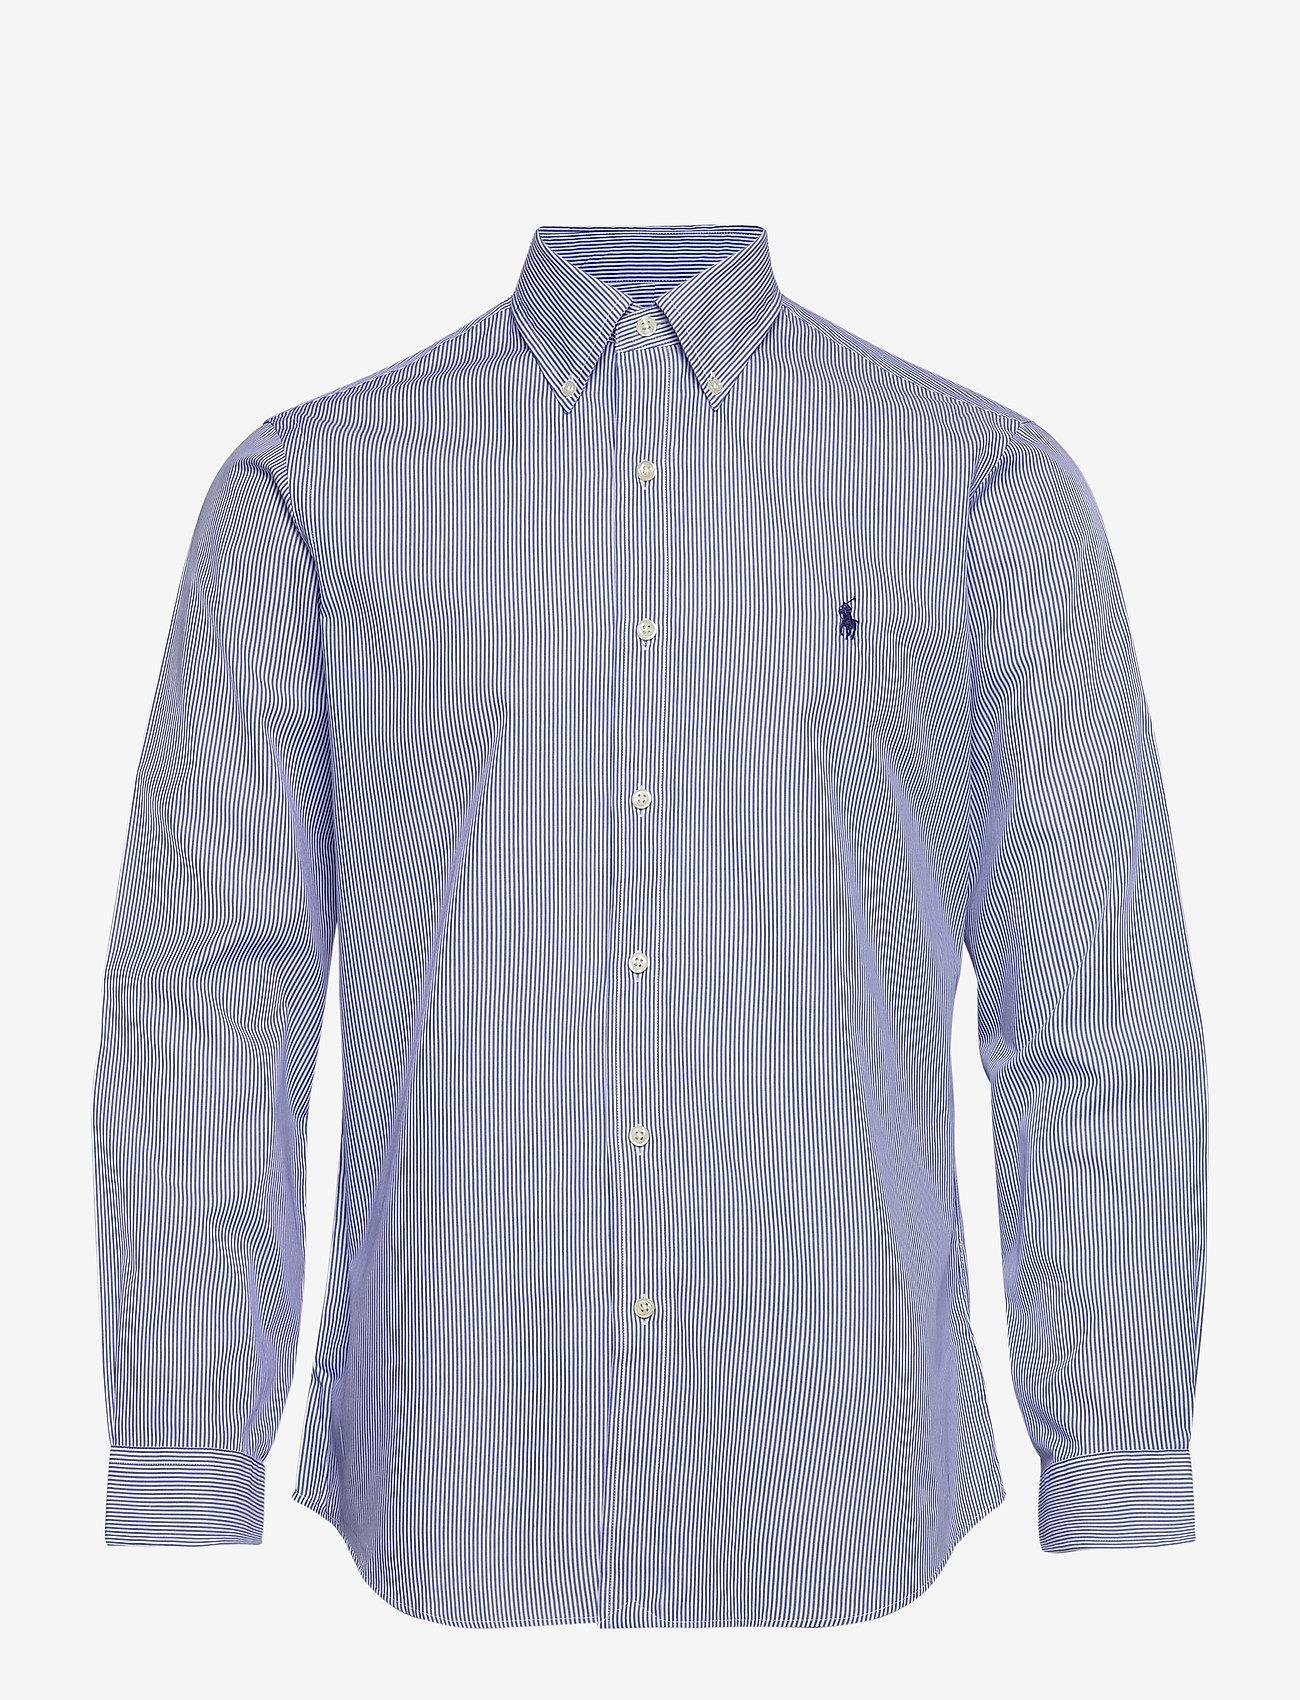 Polo Ralph Lauren - Custom Fit Poplin Shirt - podstawowe koszulki - 2866 blue/white h - 0